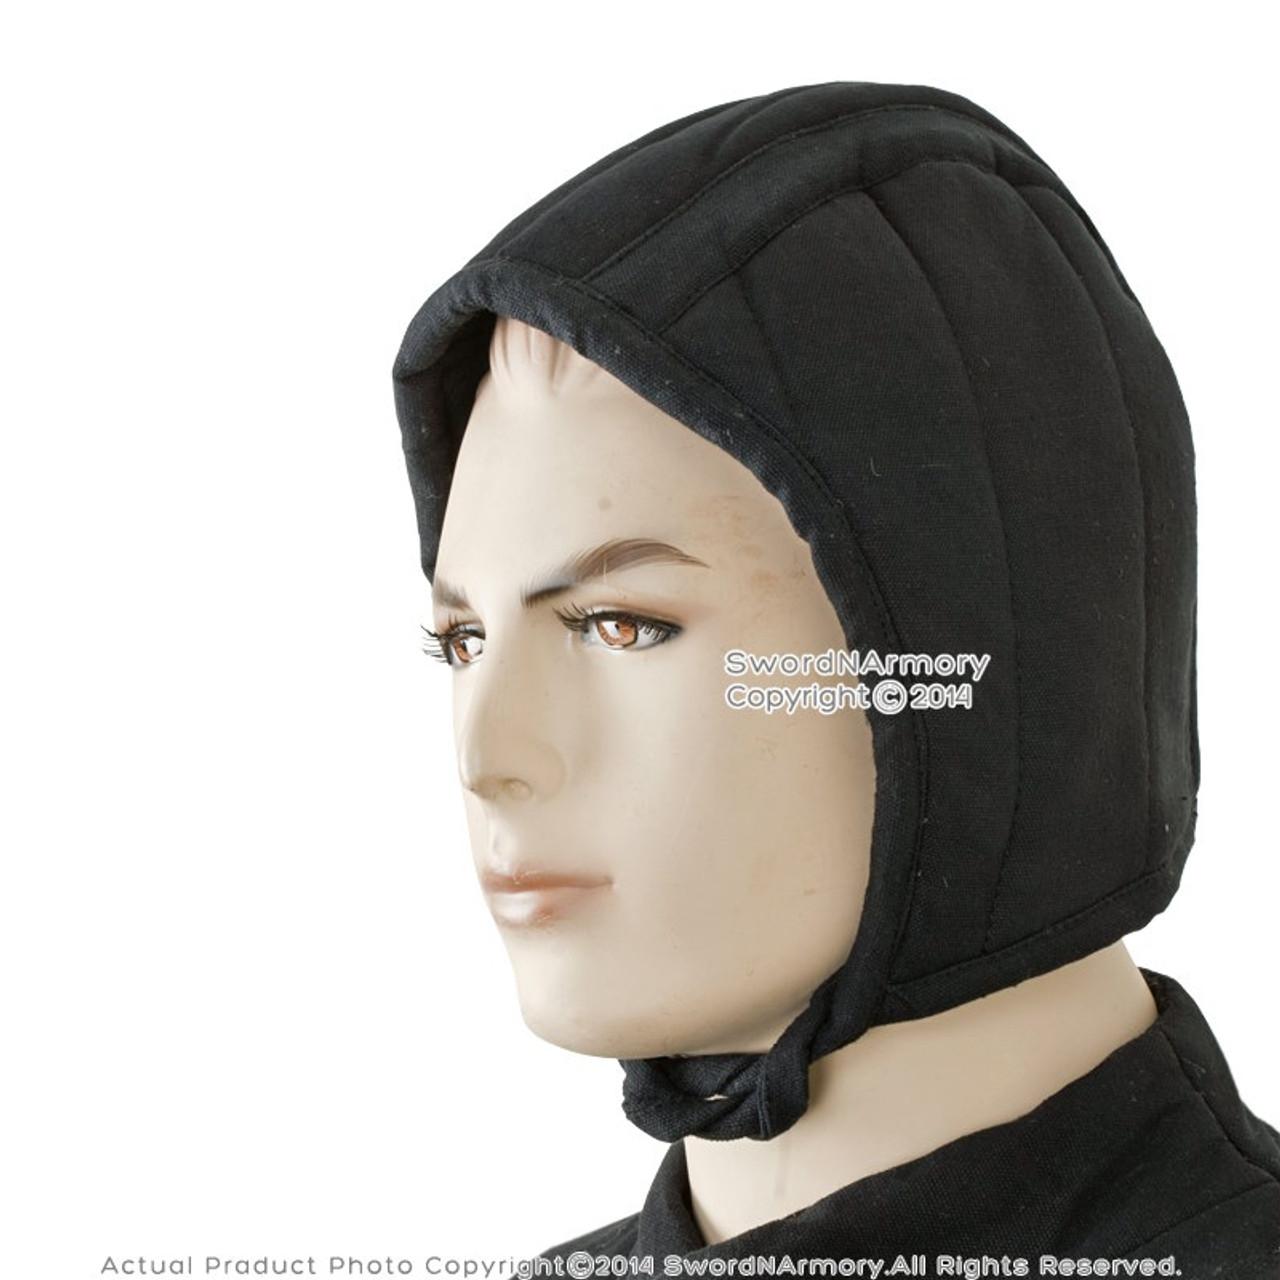 Medieval//LARP//SCA//Cosplay//Re enactment Cotton Brown-Cap-Coif-Arming Cap